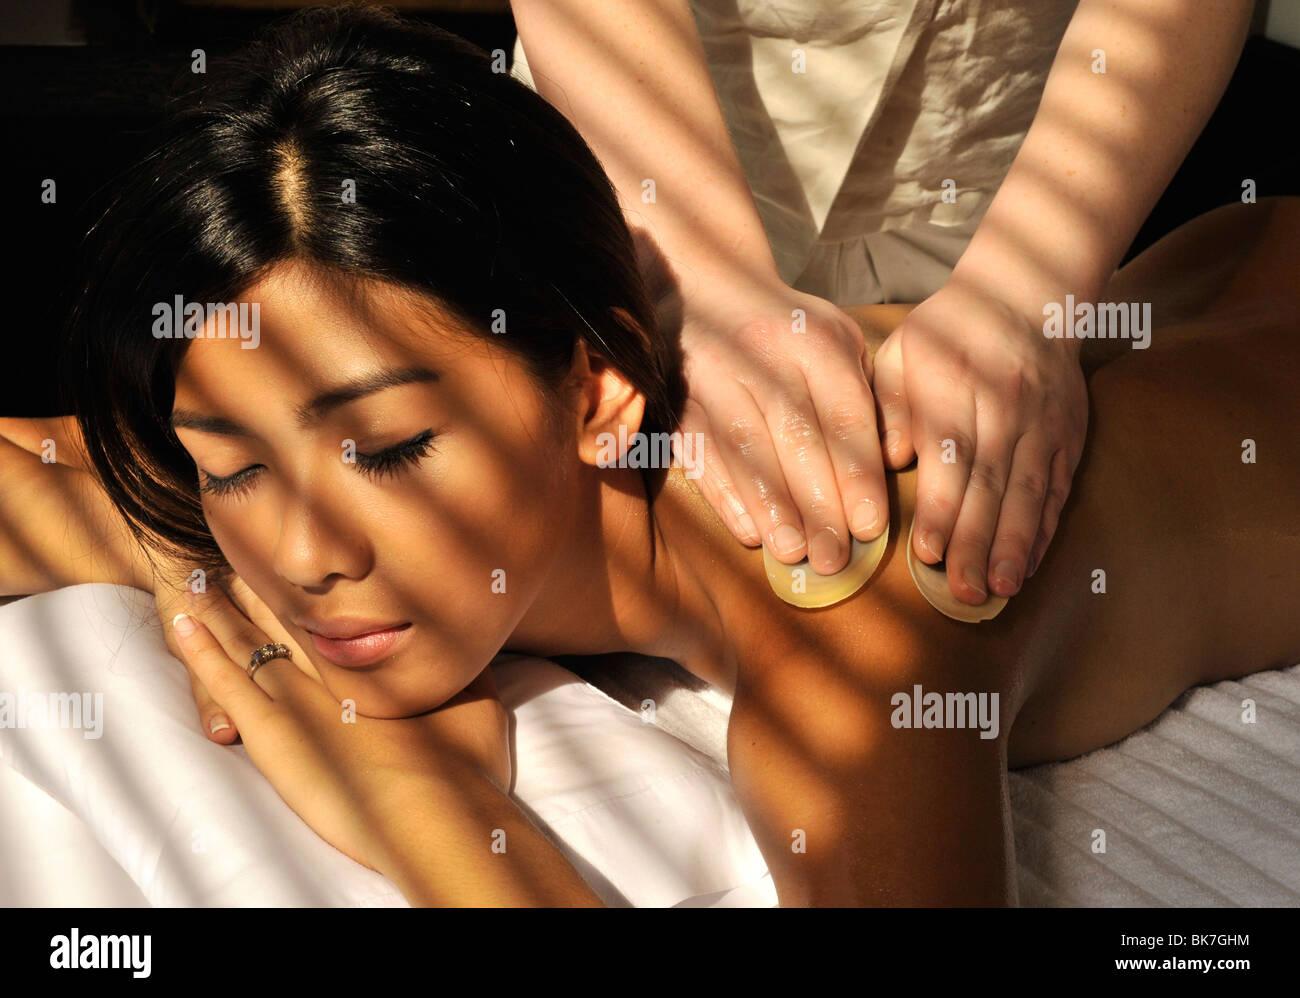 Coconut oil massage with shells, Le Spa at Sofitel Manila, Philippines, Southeast Asia, Asia - Stock Image